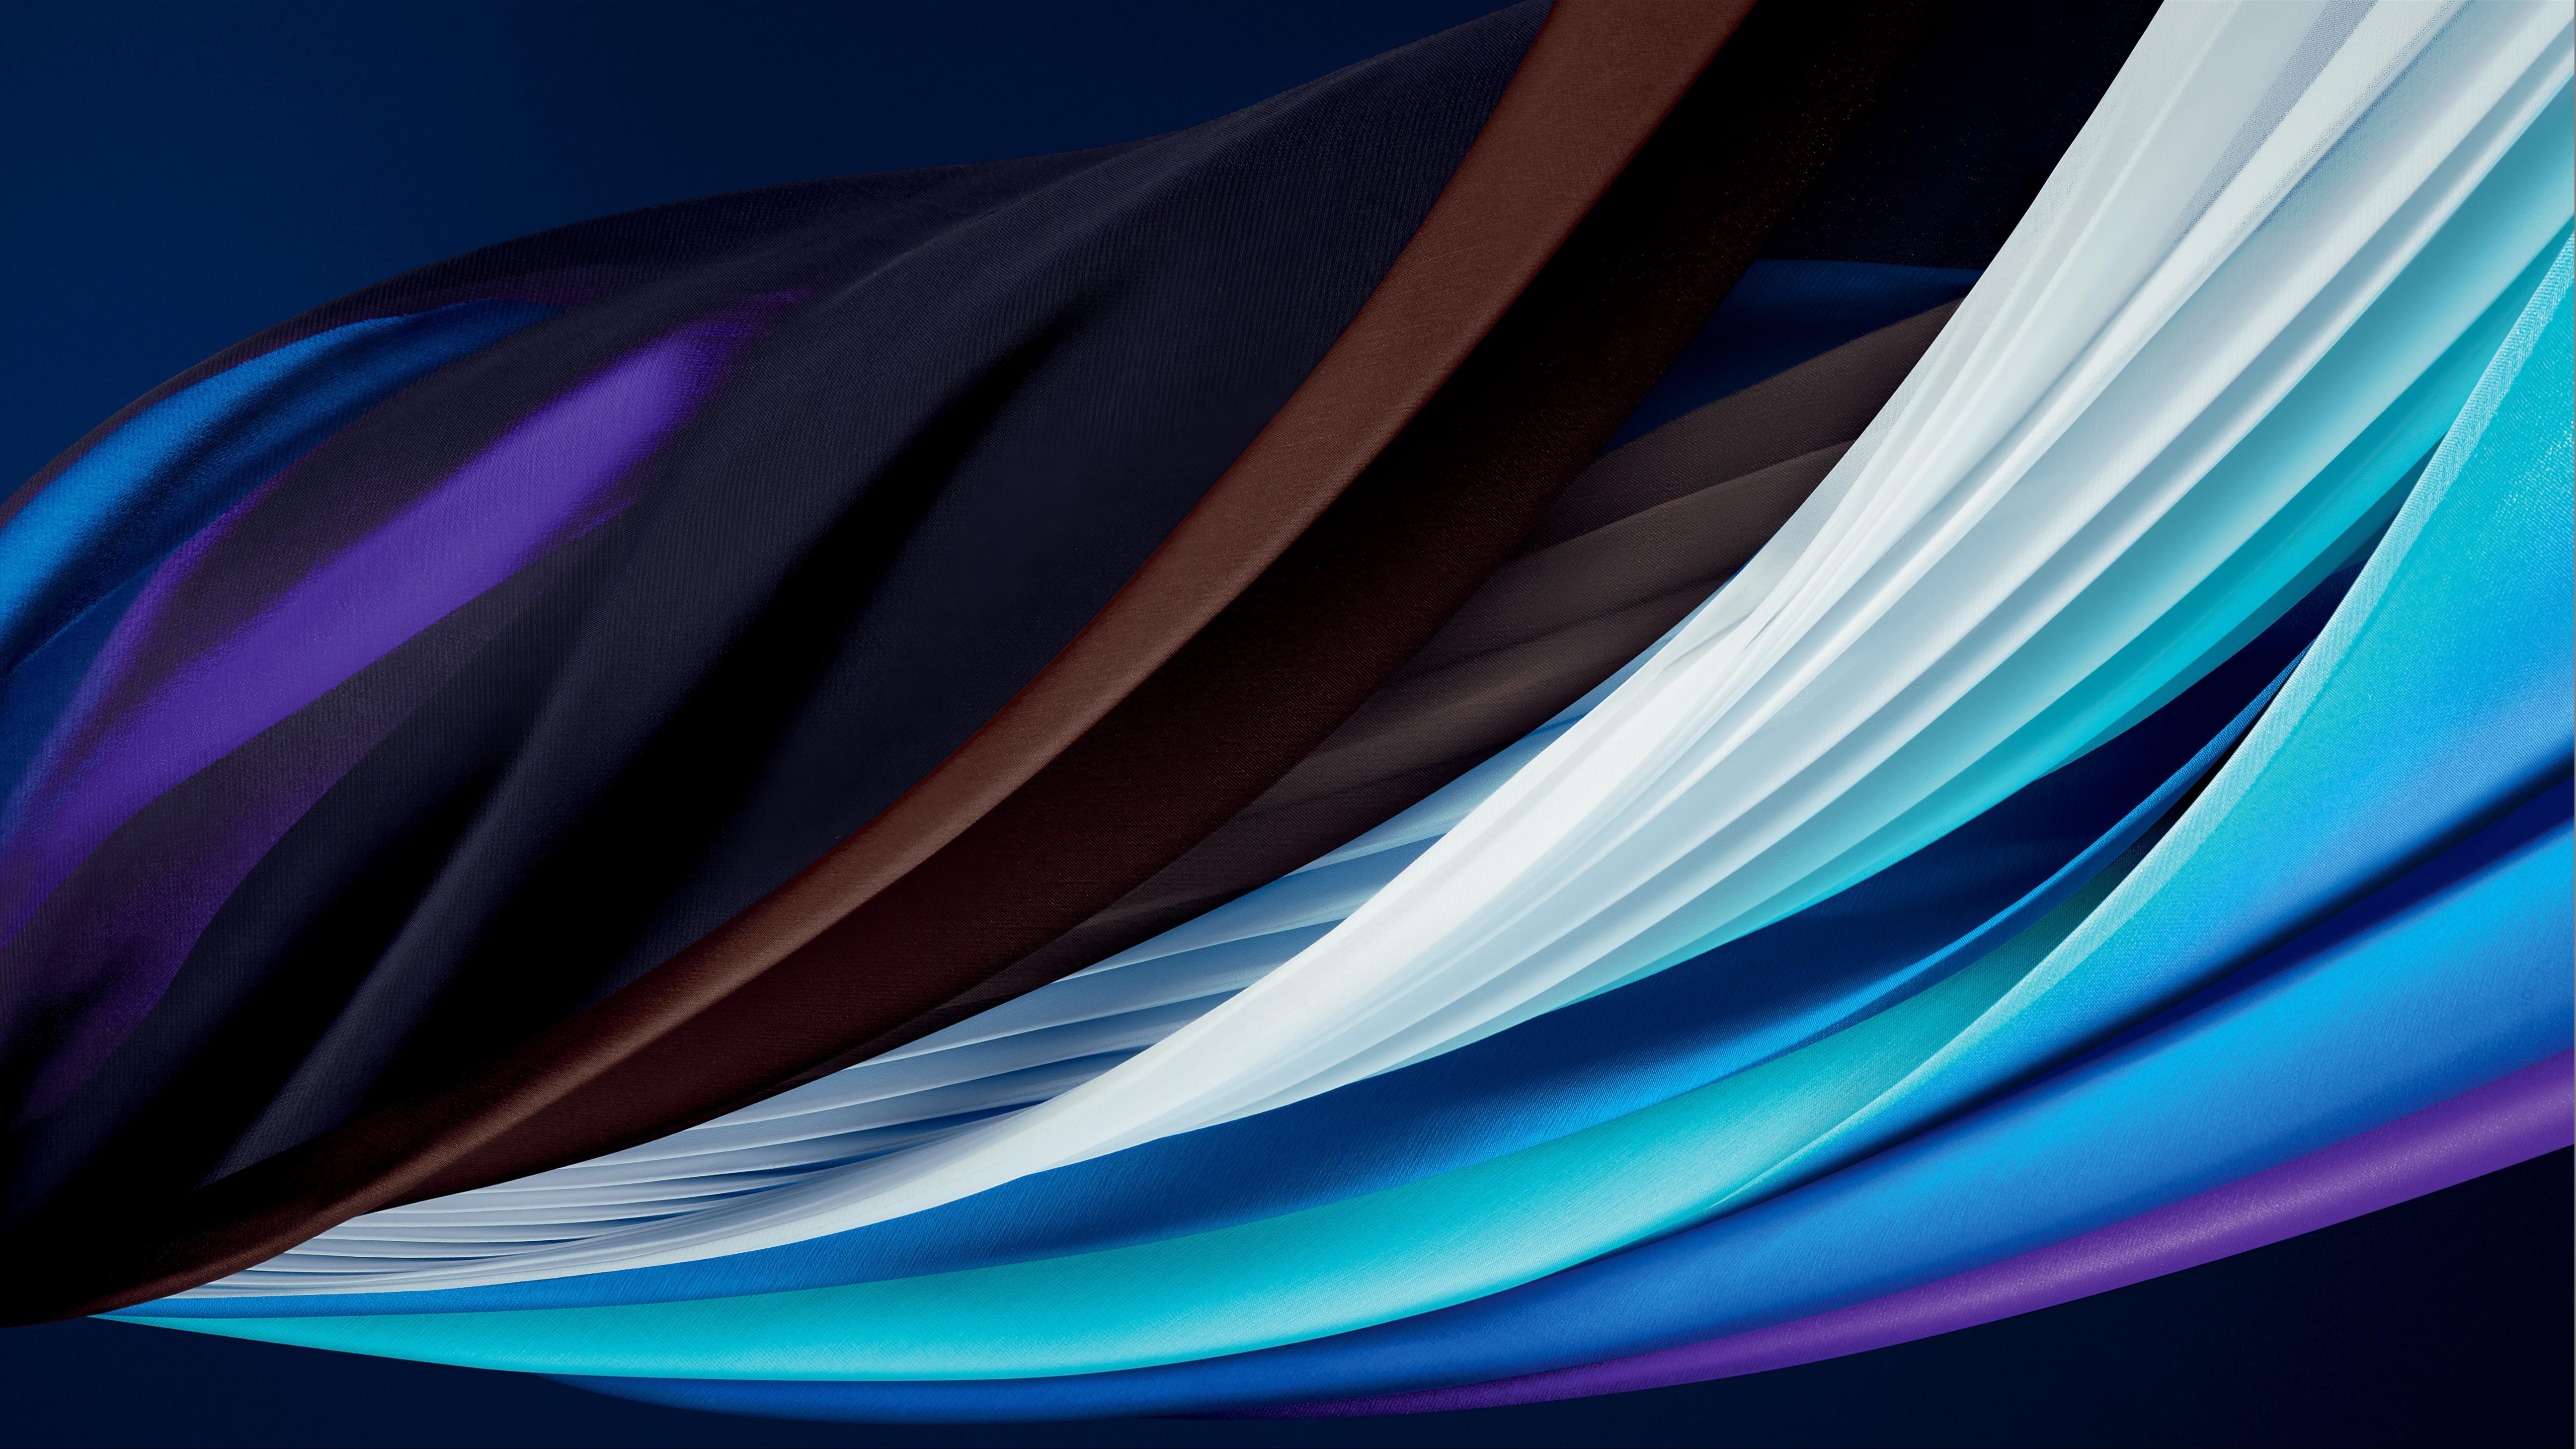 Iphone Se 4k Wallpaper Ios 14 Blue Stock 2020 5k 8k Abstract 1441